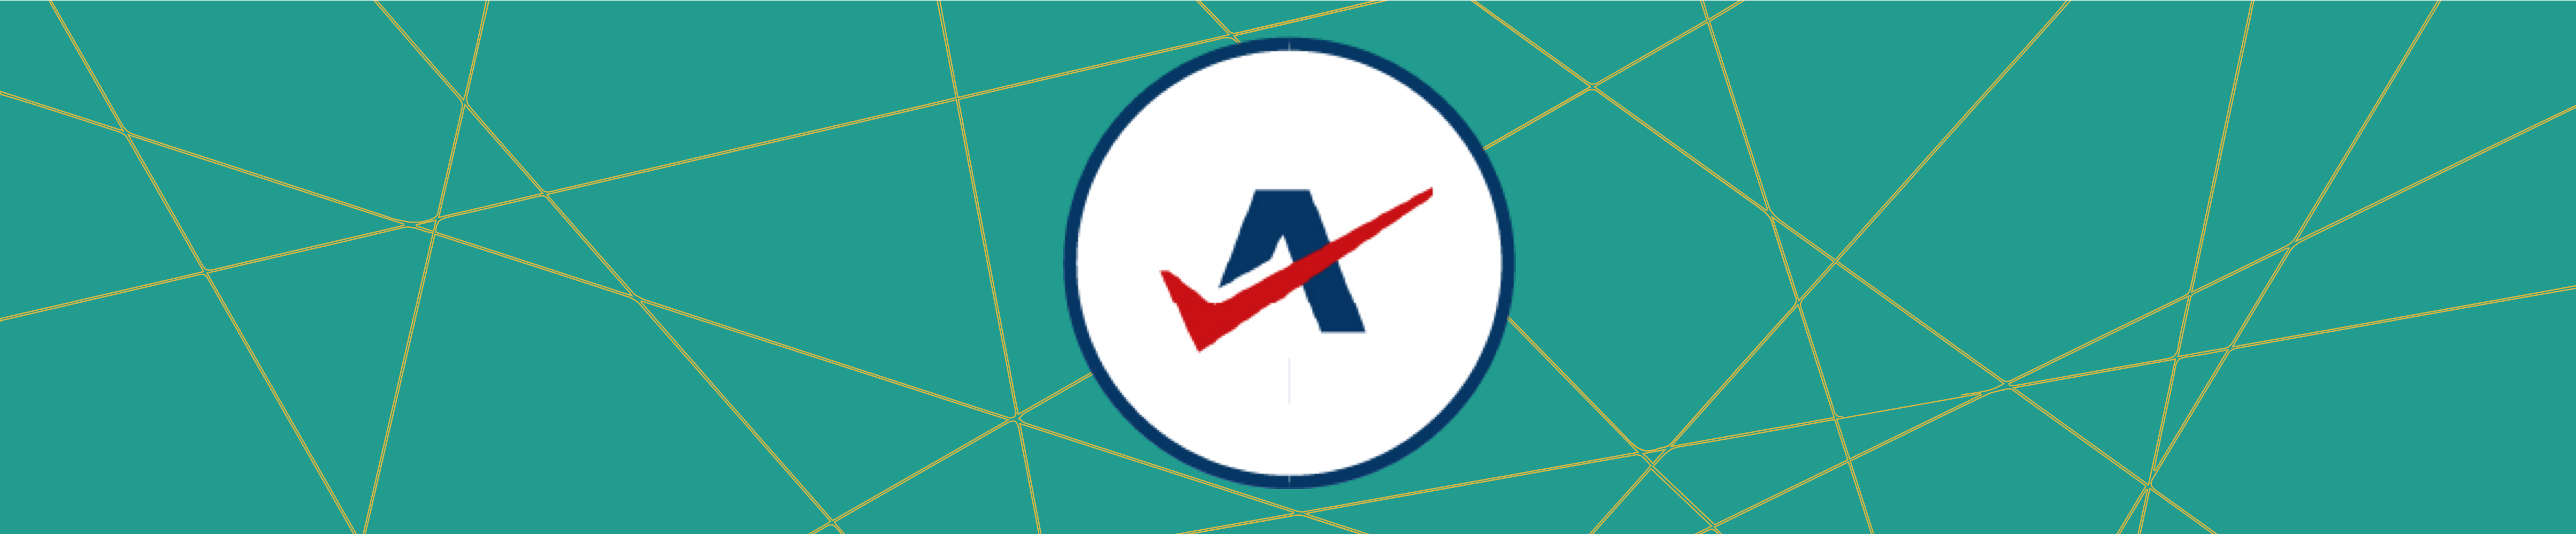 Autotask_banner